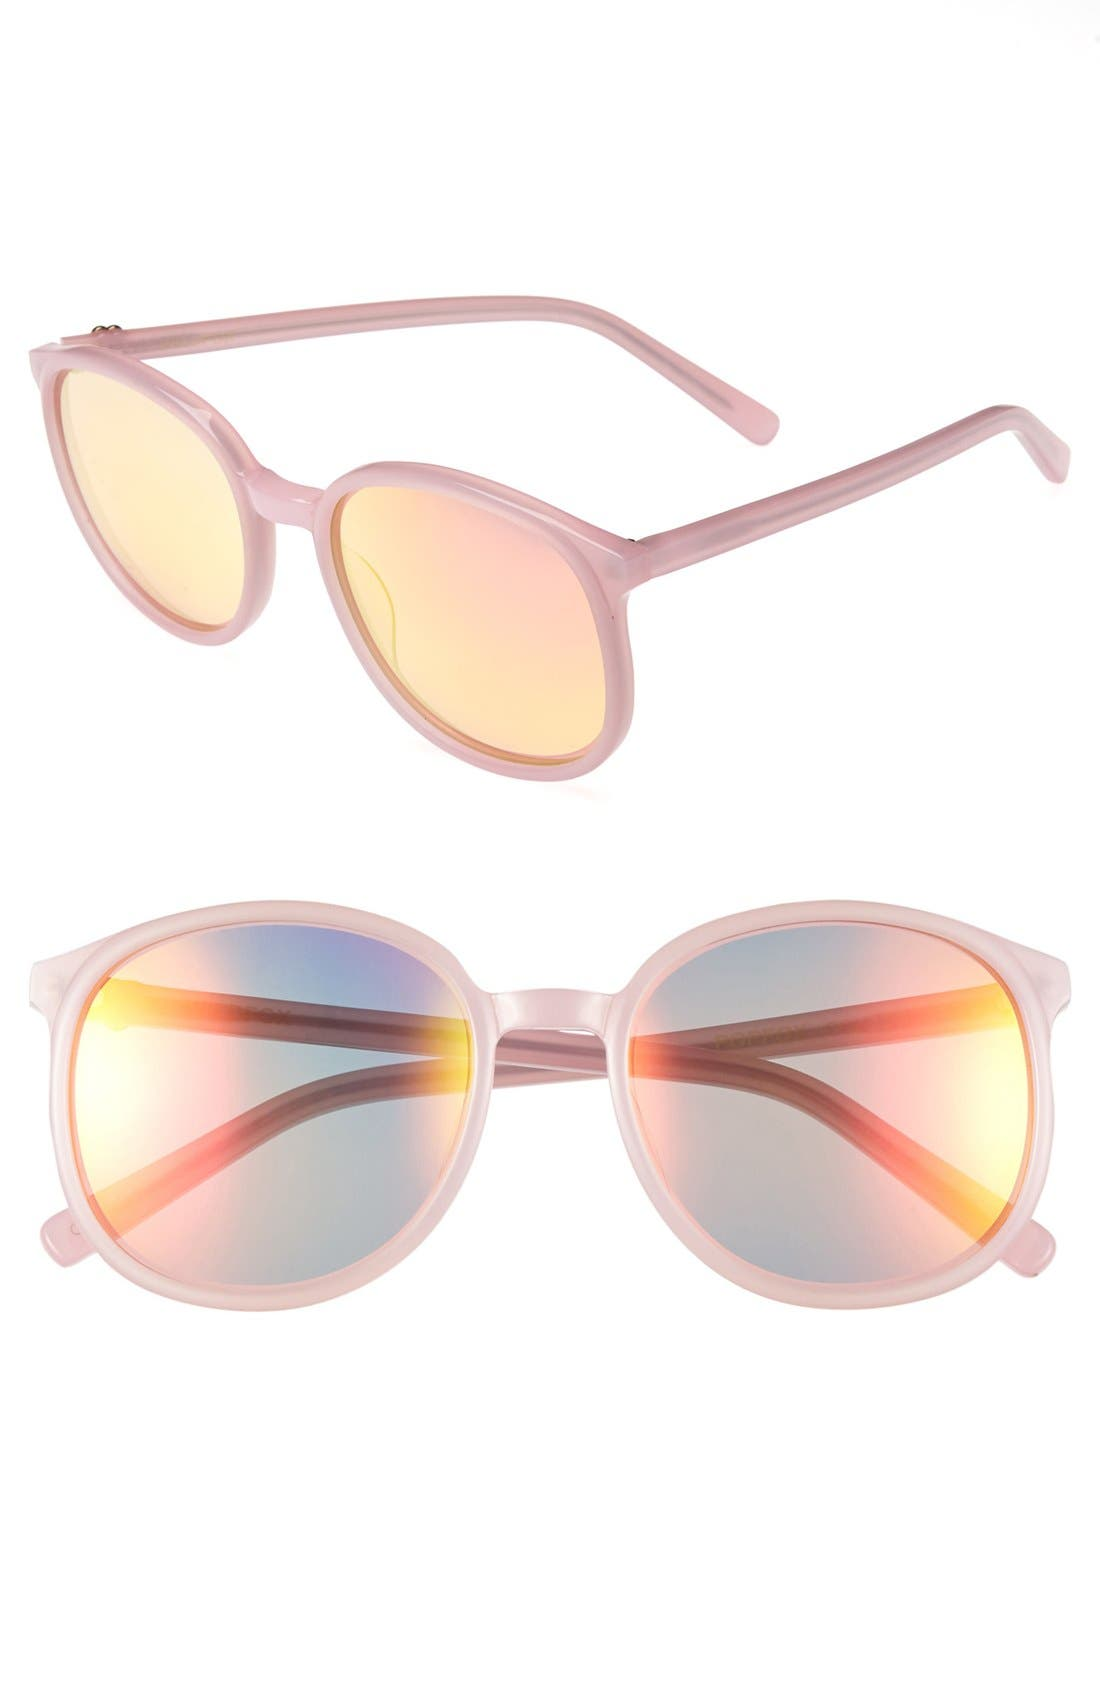 Alternate Image 1 Selected - Wildfox 'Popfox Deluxe' Sunglasses